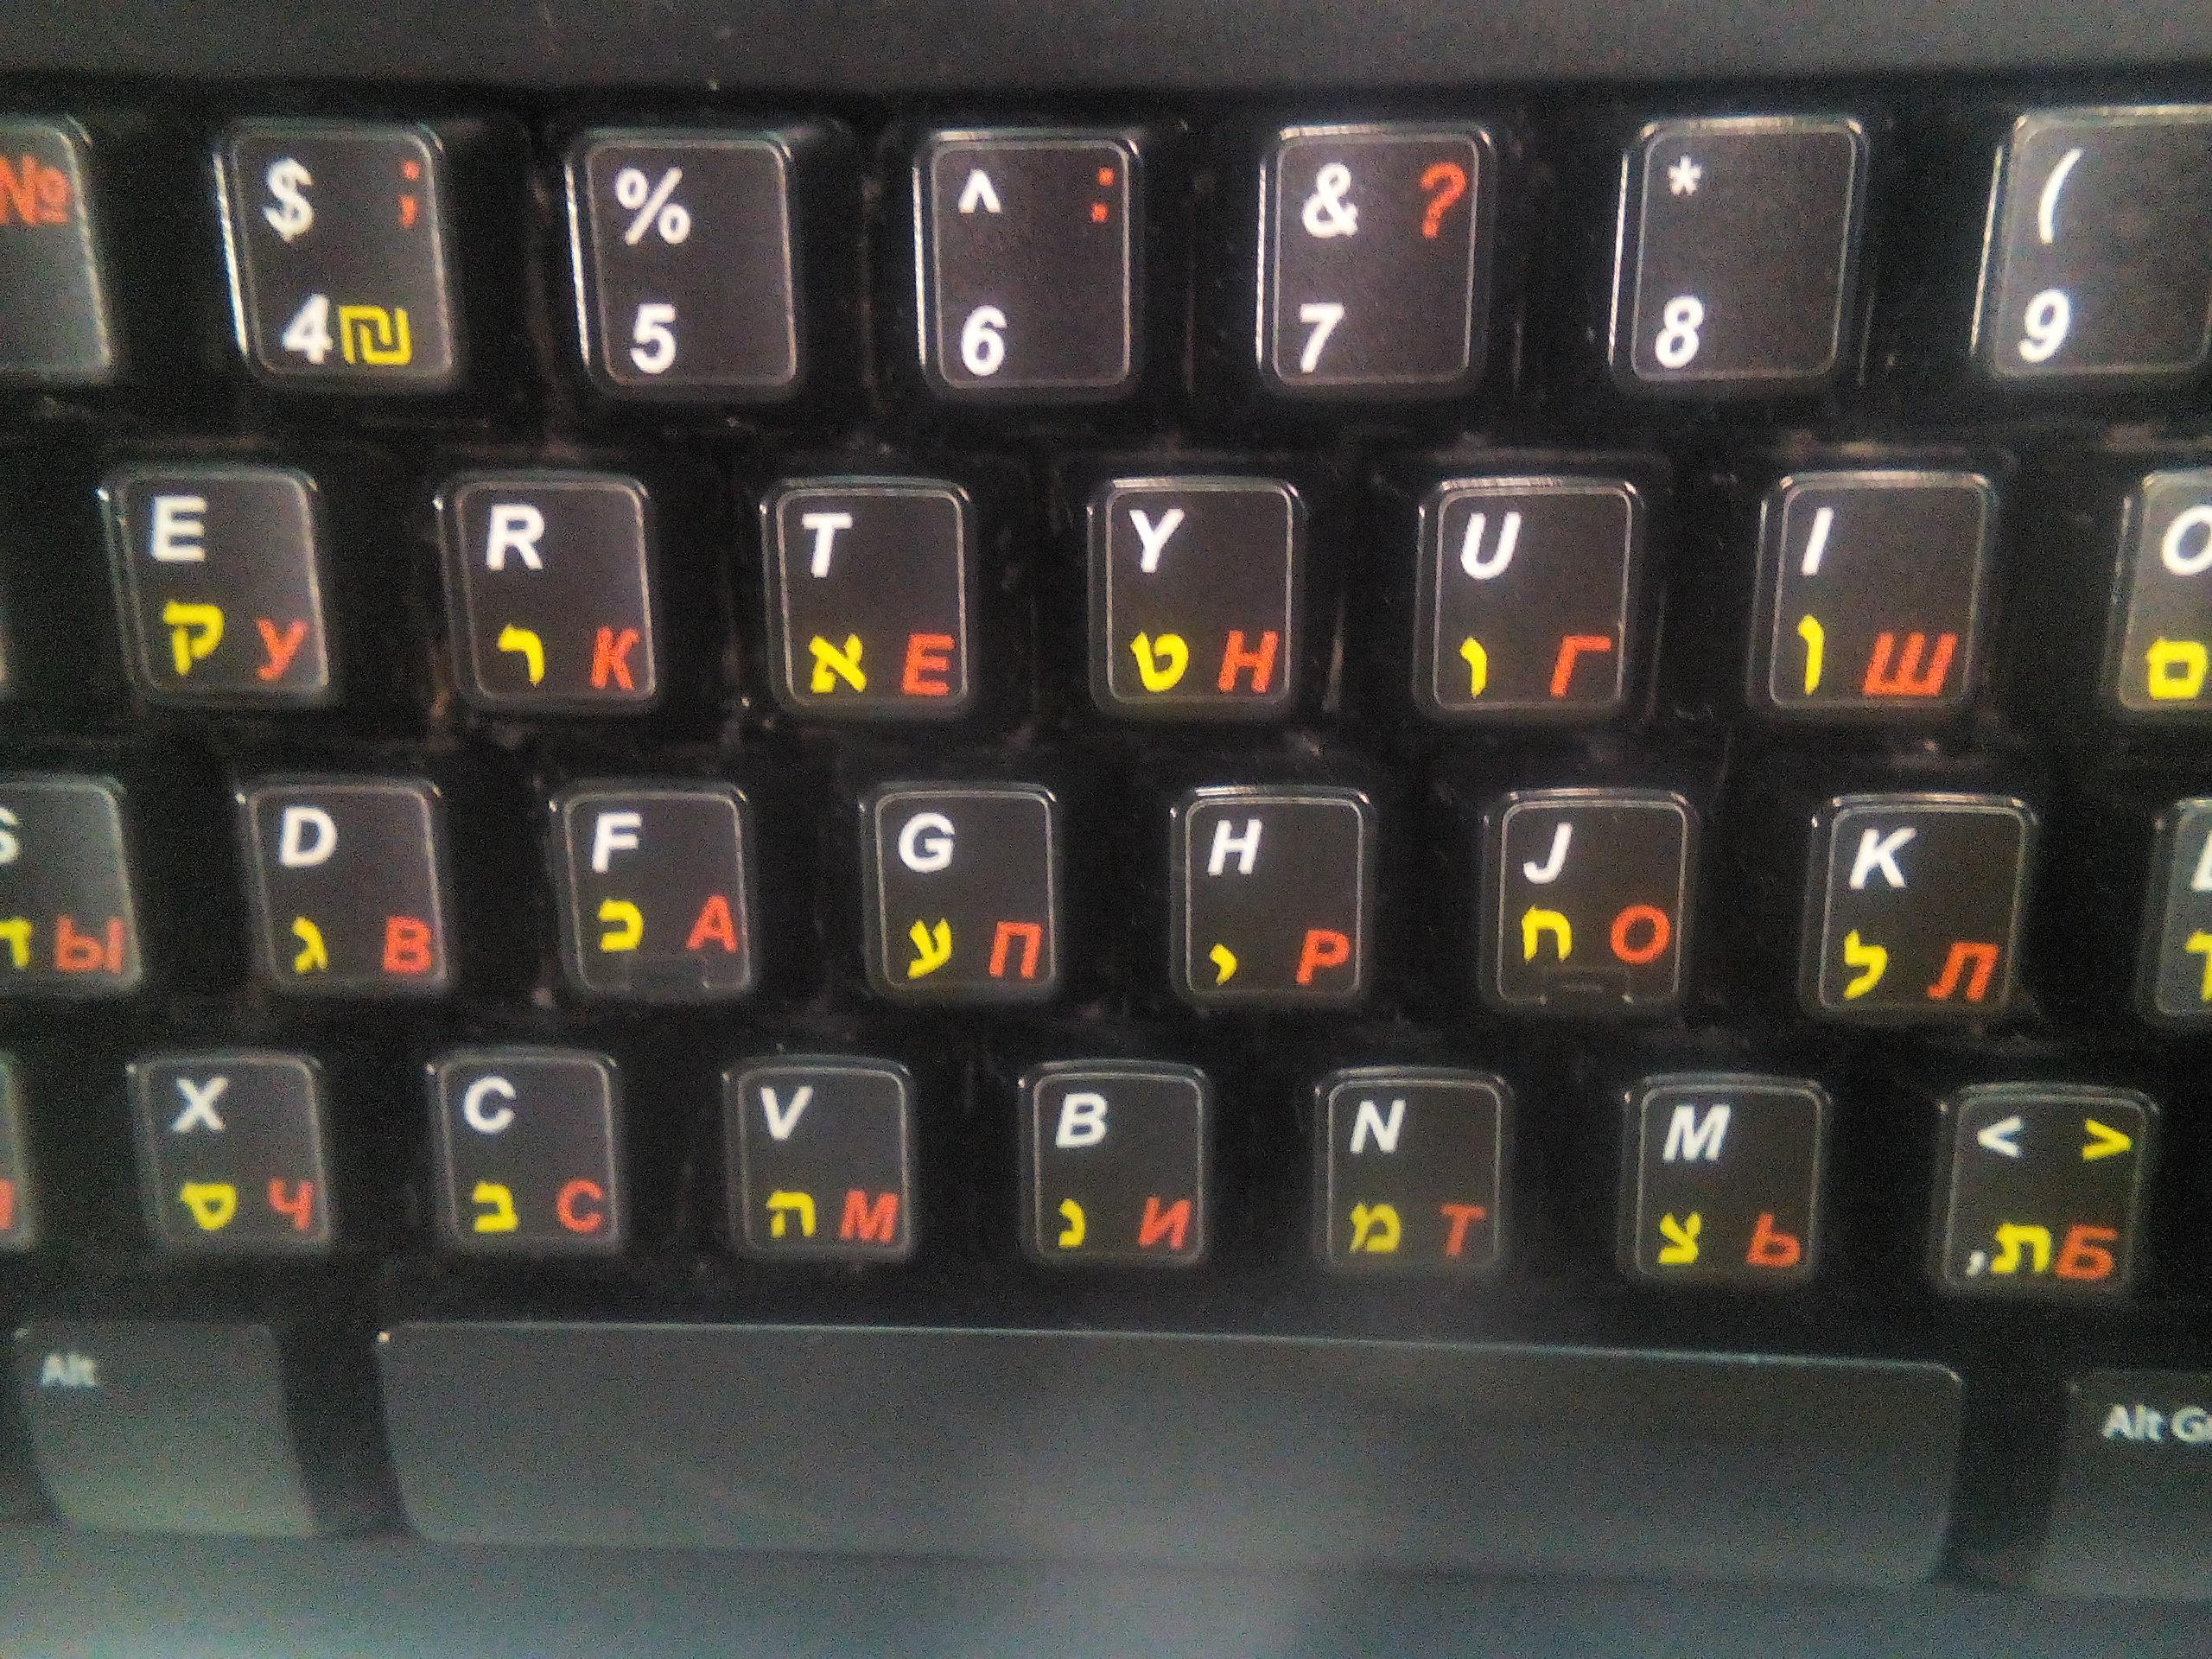 Hebrew Greek Keyboard Sticker Non Transparent Black for Computer